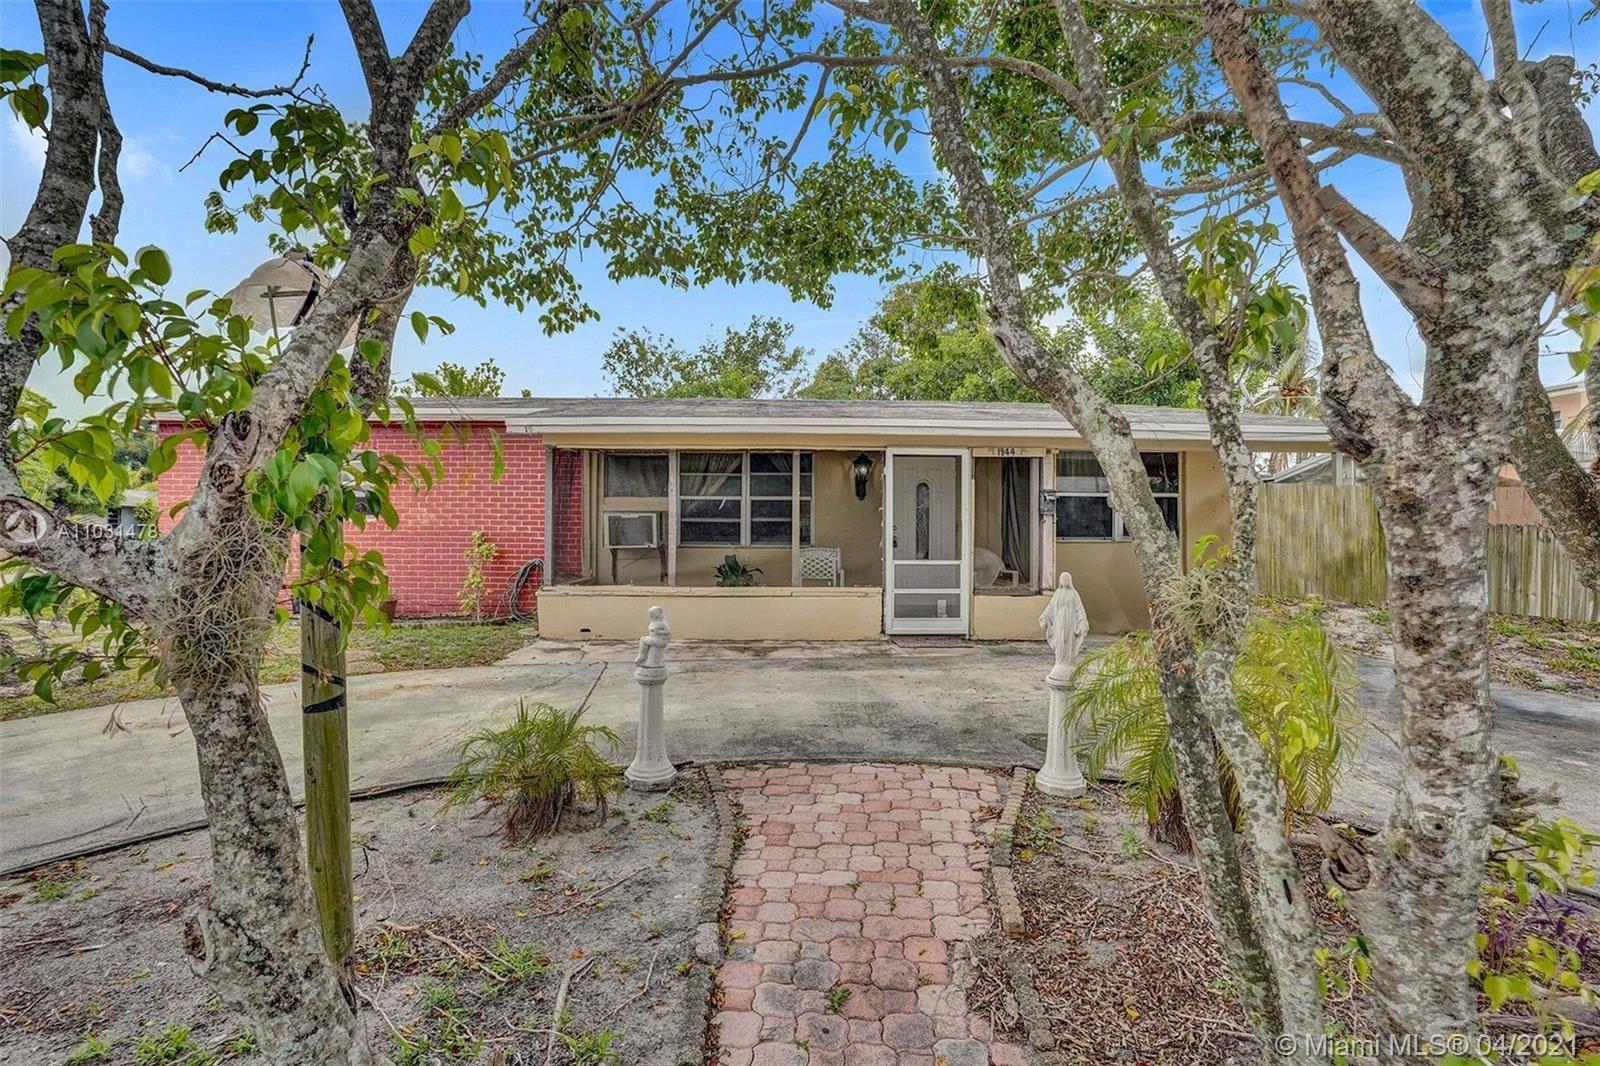 1944 NE 2nd Ave, Pompano Beach, FL 33060 - #: A11031478